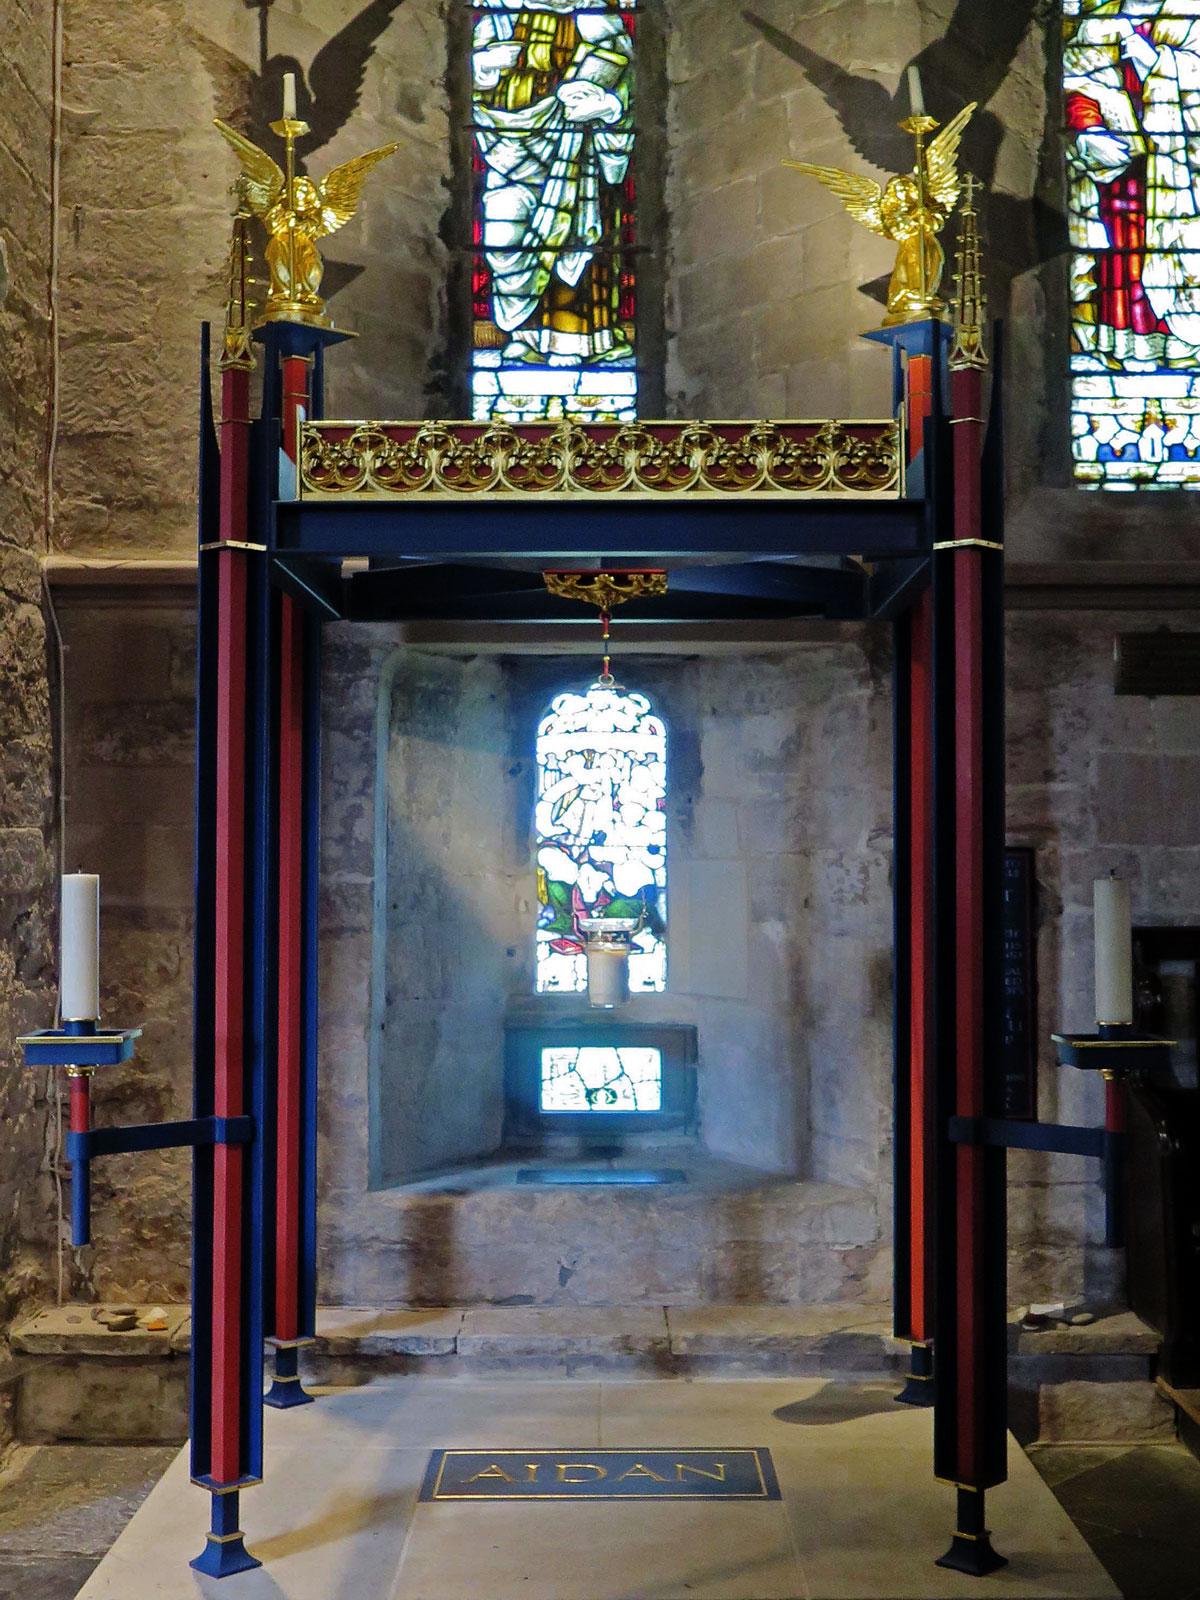 St. Aidan's Shrine in Bamburgh